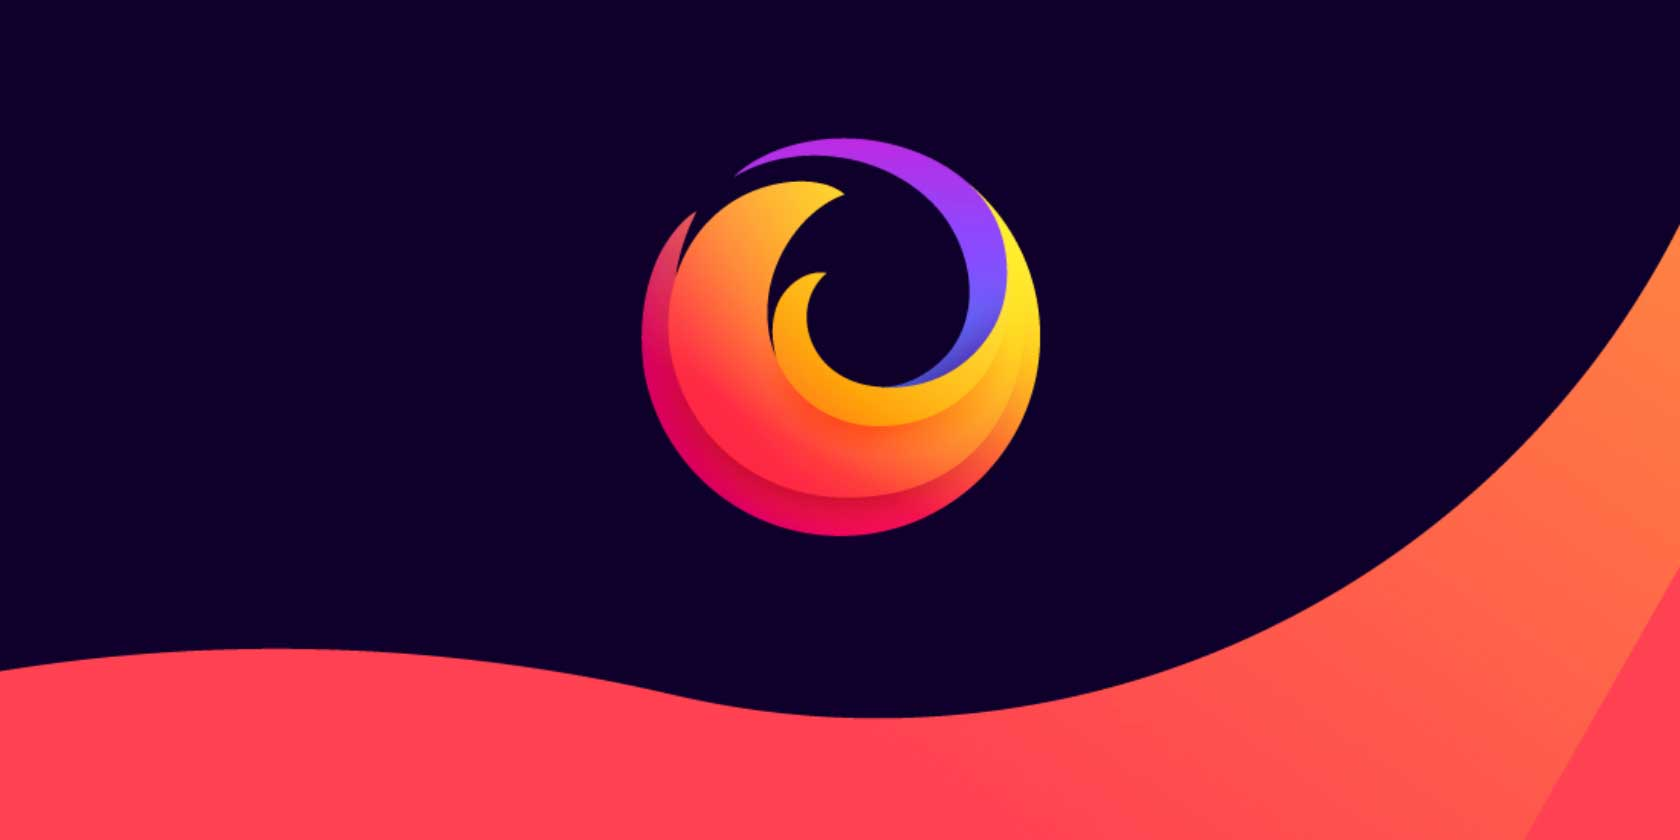 فایرفاکس ۸۳ حالت HTTPS-Only خواهد داشت